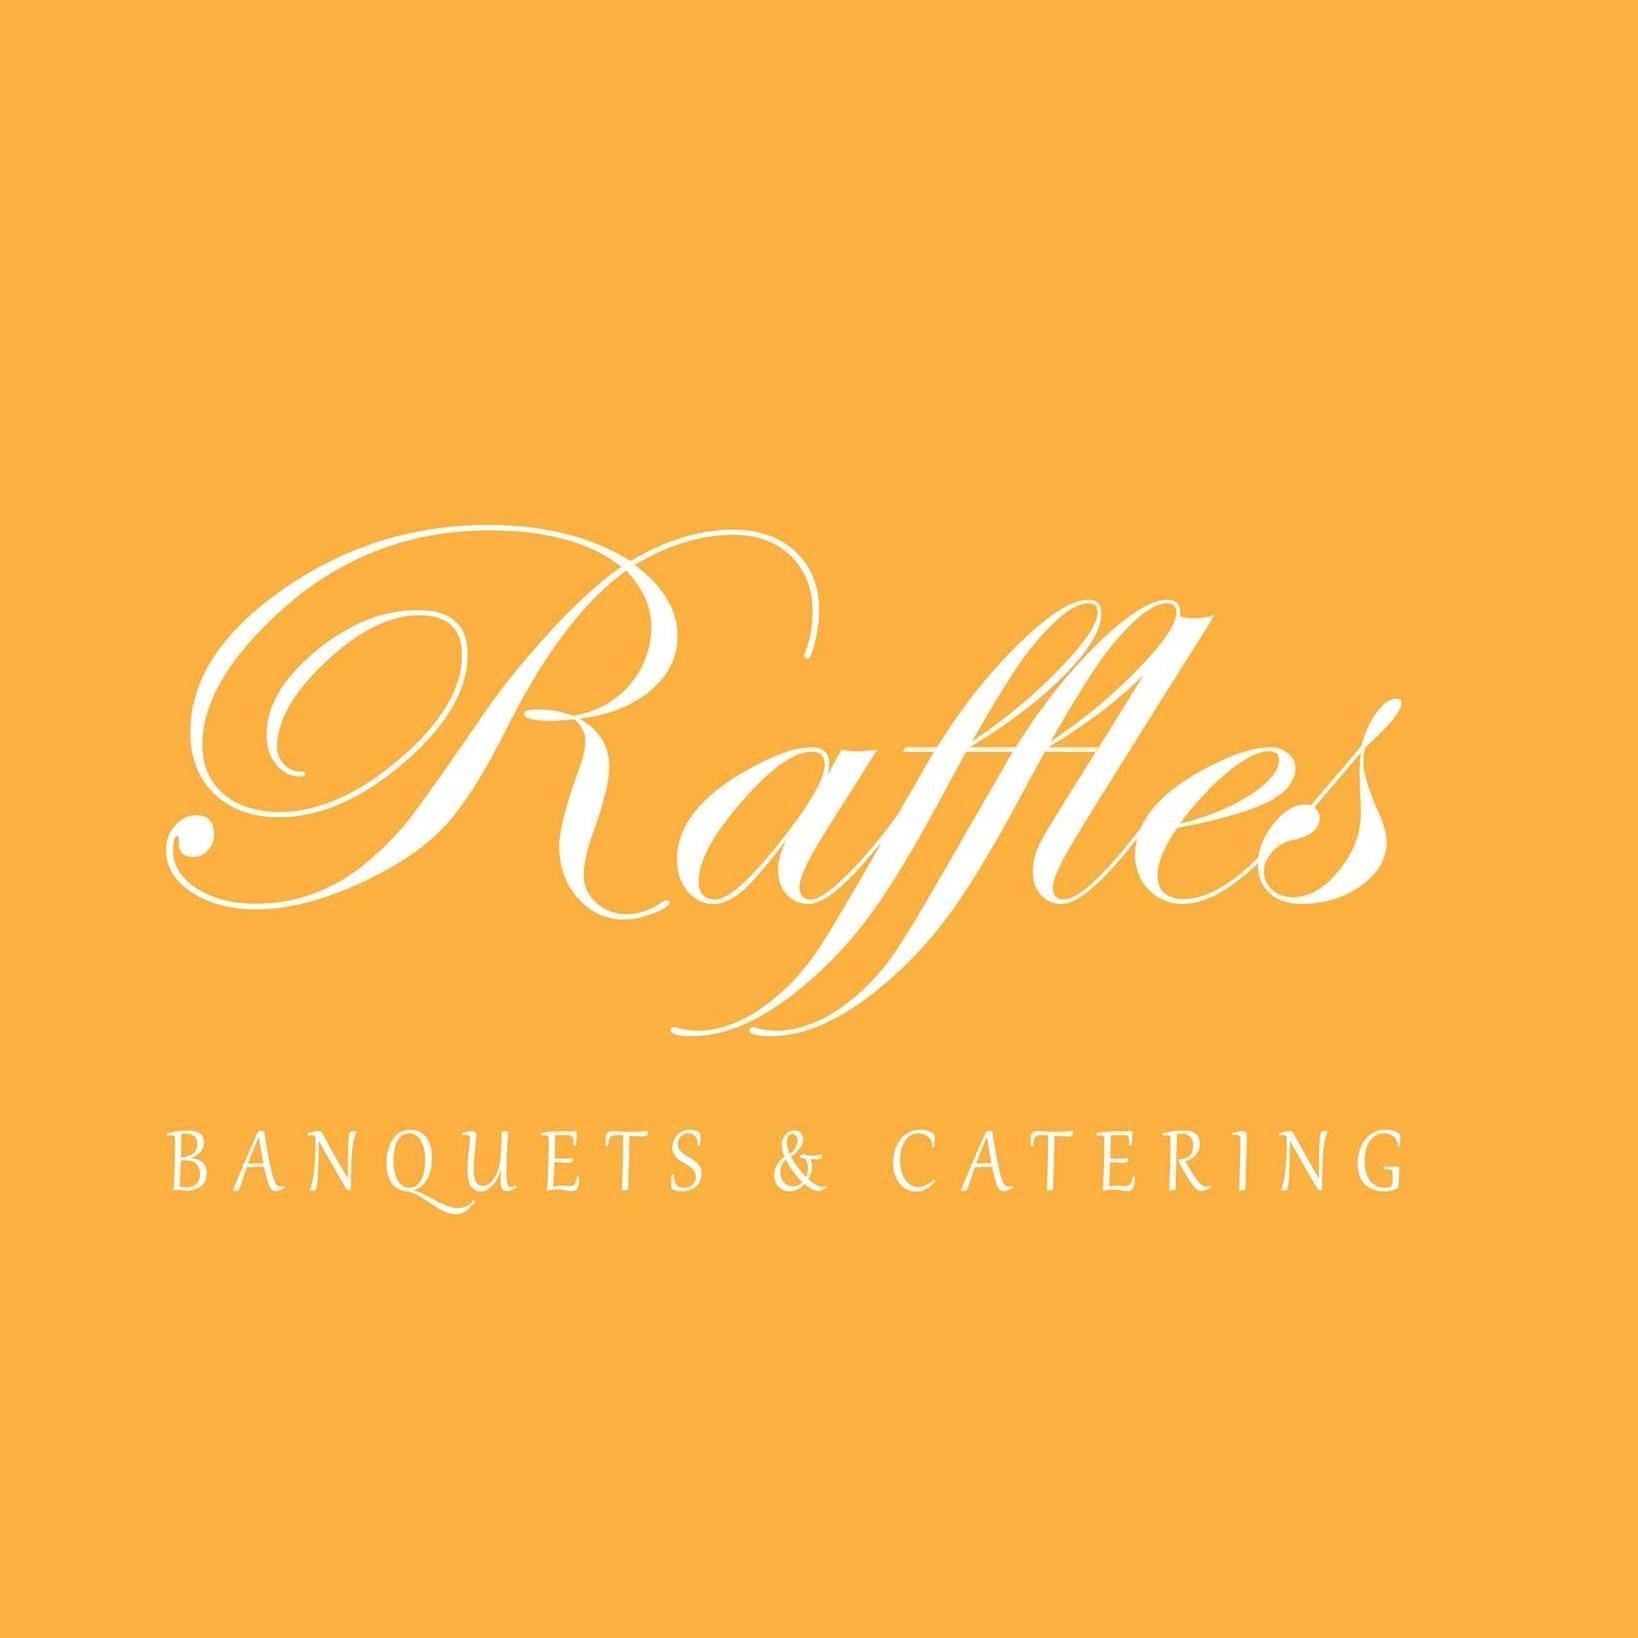 Raffles Banquets & Catering